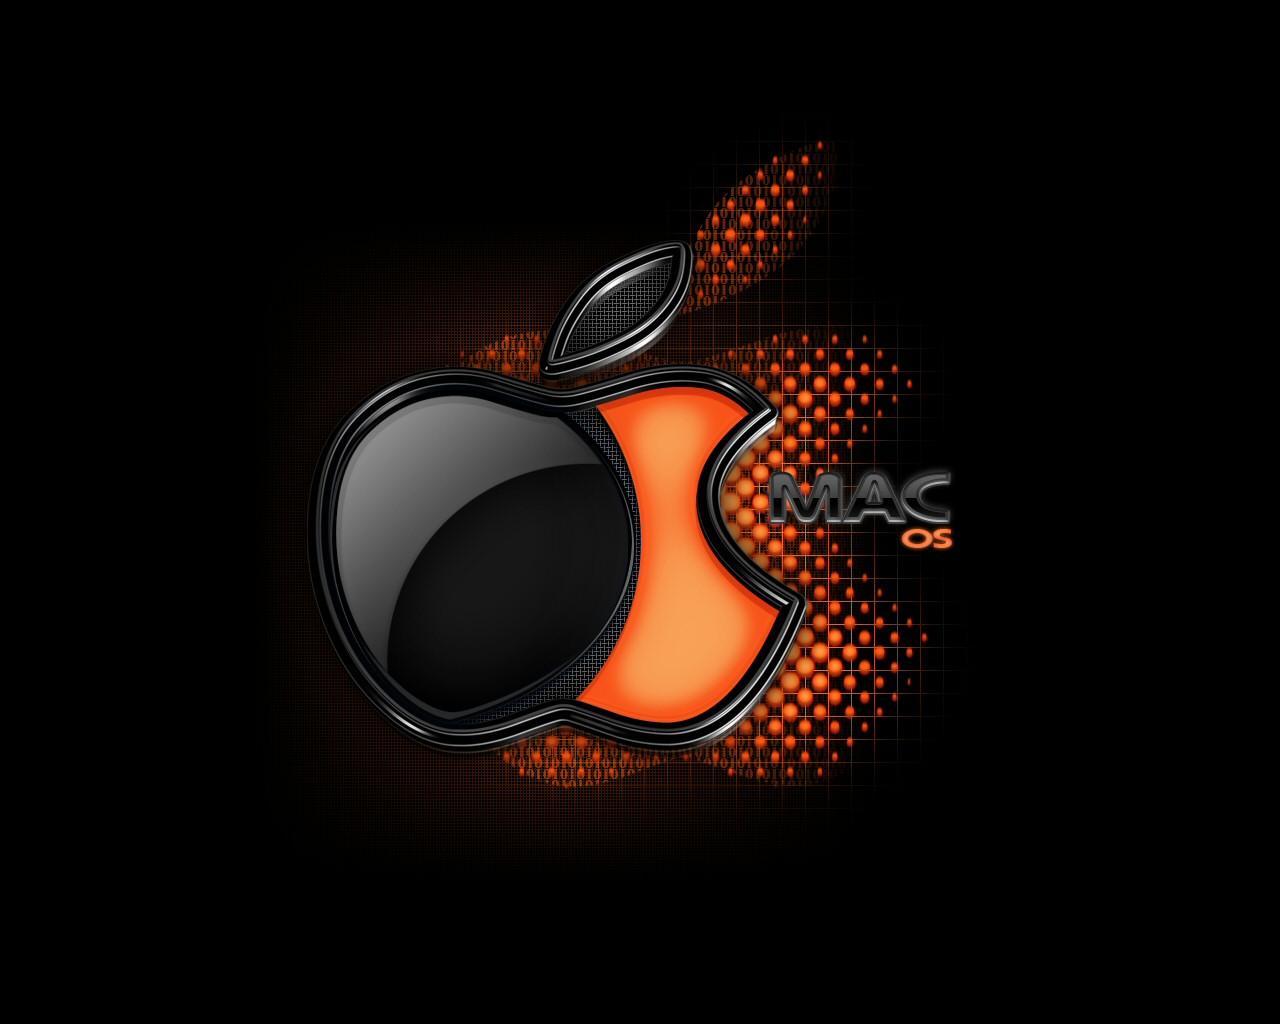 Mac desktop wallpaper hd full hd p best hd mac hd pictures 1280x1024 voltagebd Image collections